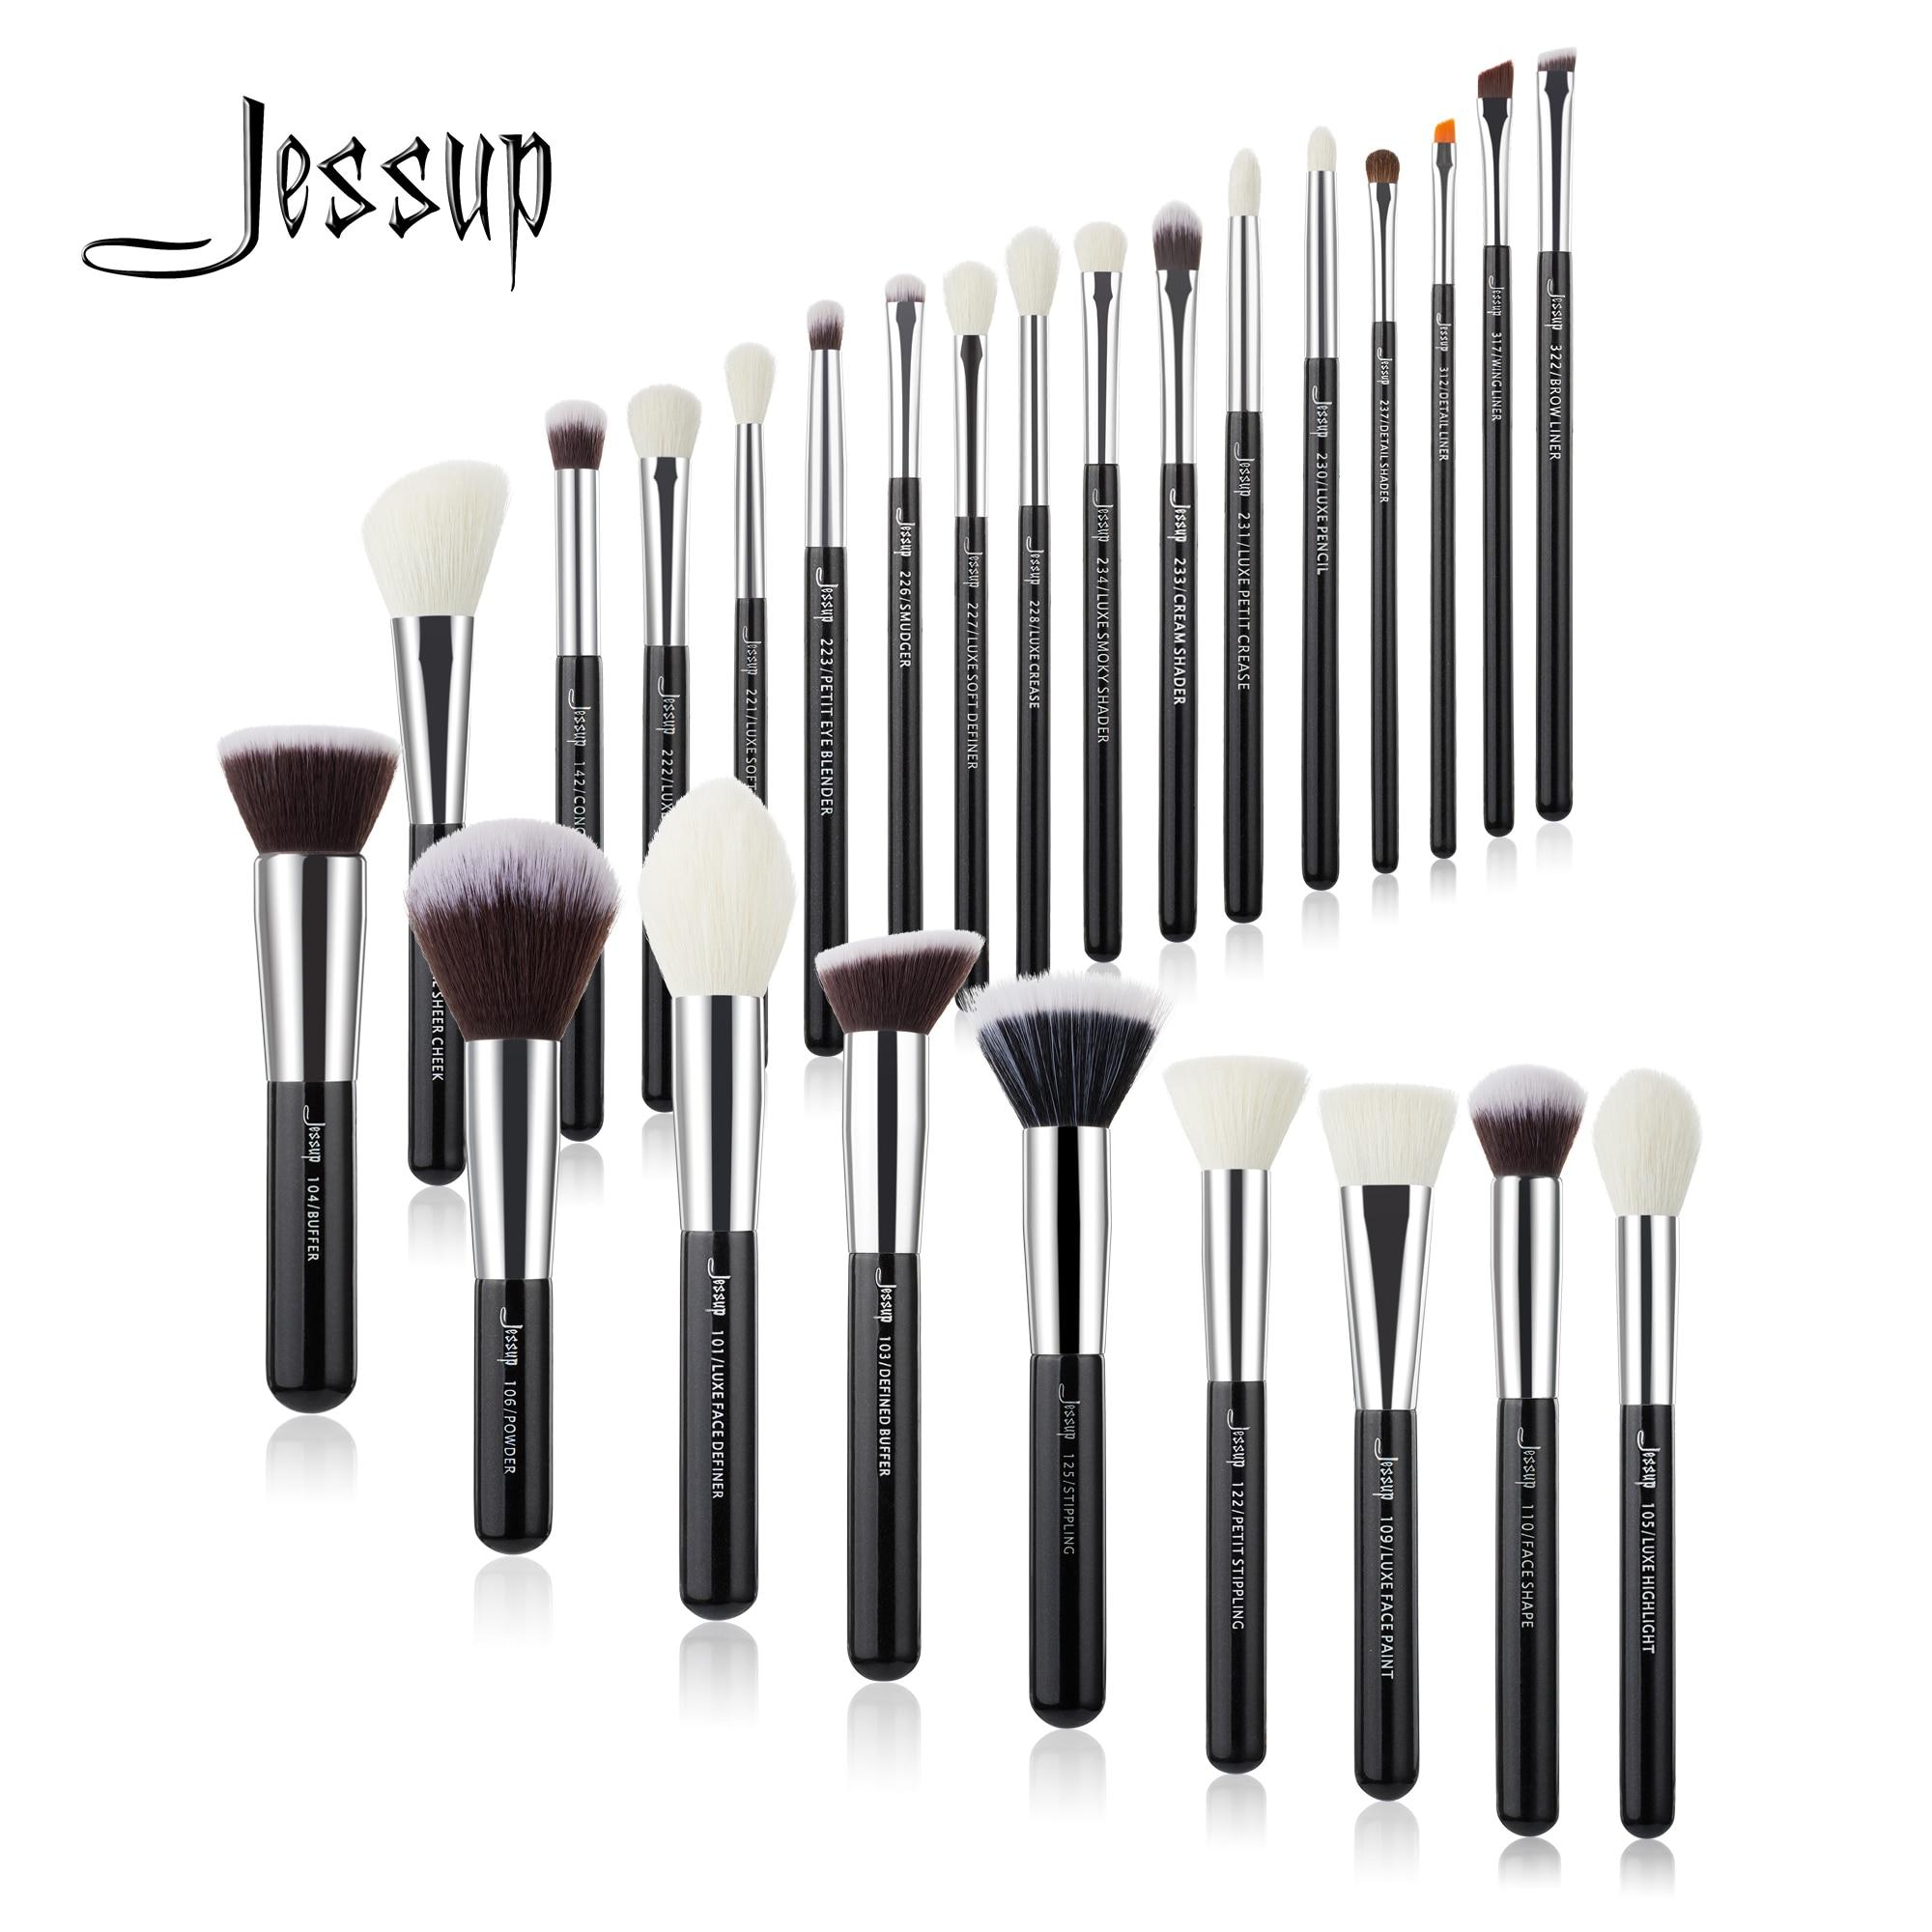 Jessup Black/Silver Professional Makeup Brushes Set Foundation Powder Eyeshadow Make up Brush Blushes natural synthetic hair|brush set make up|makeup brush setprofessional makeup brush set - AliExpress